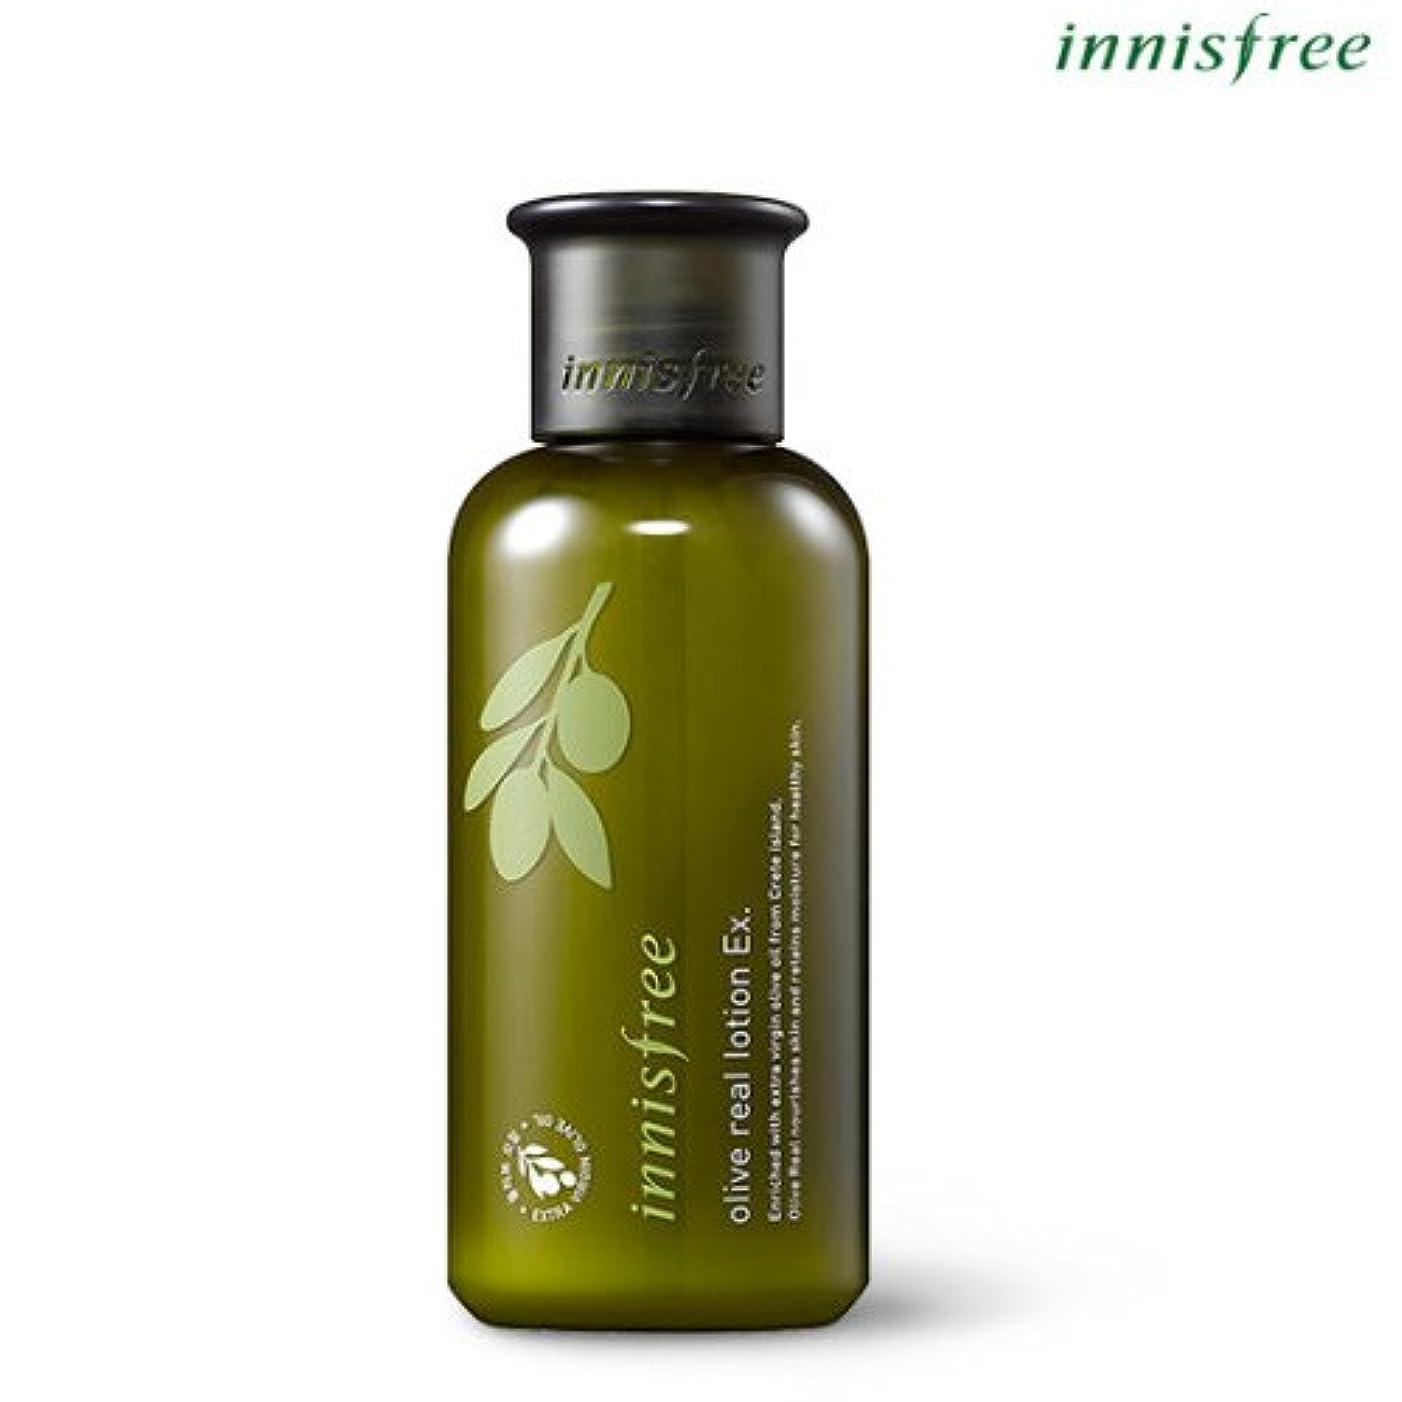 [INNISFREE]イニスフリーオリーブリアルローションEx.160ml olive real lotion Ex.160ml [並行輸入品]